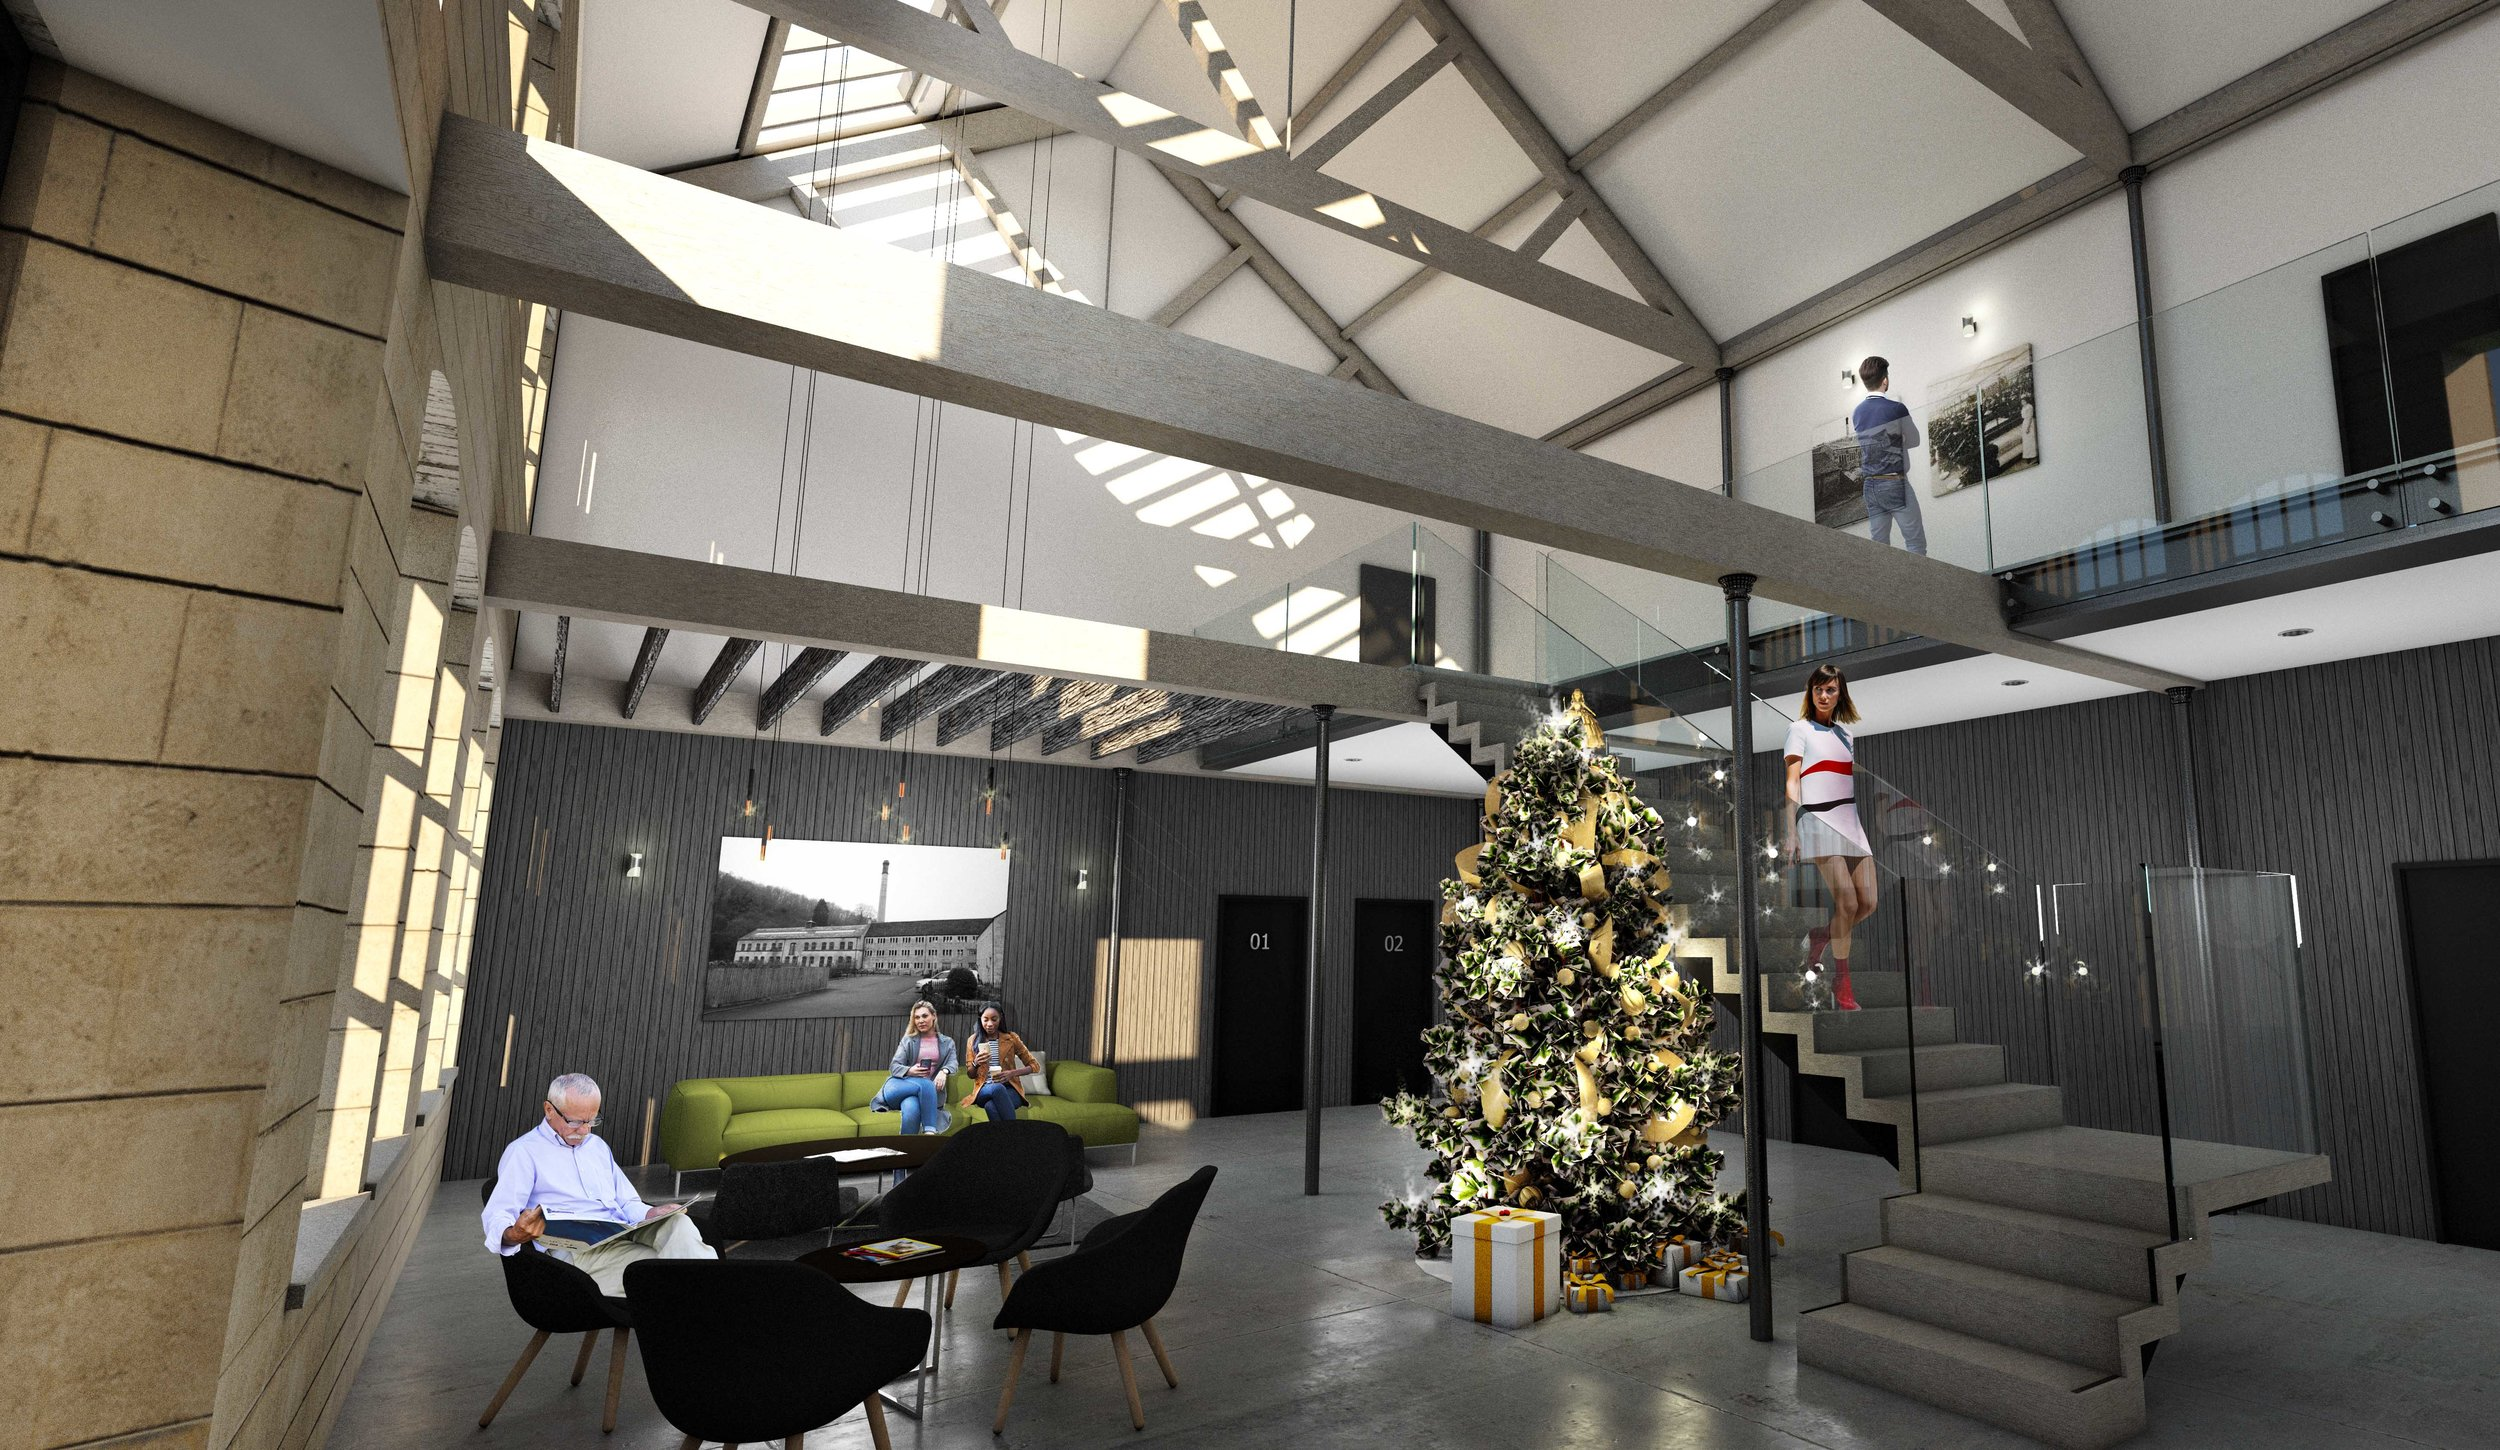 Design concept for Longfords Mill